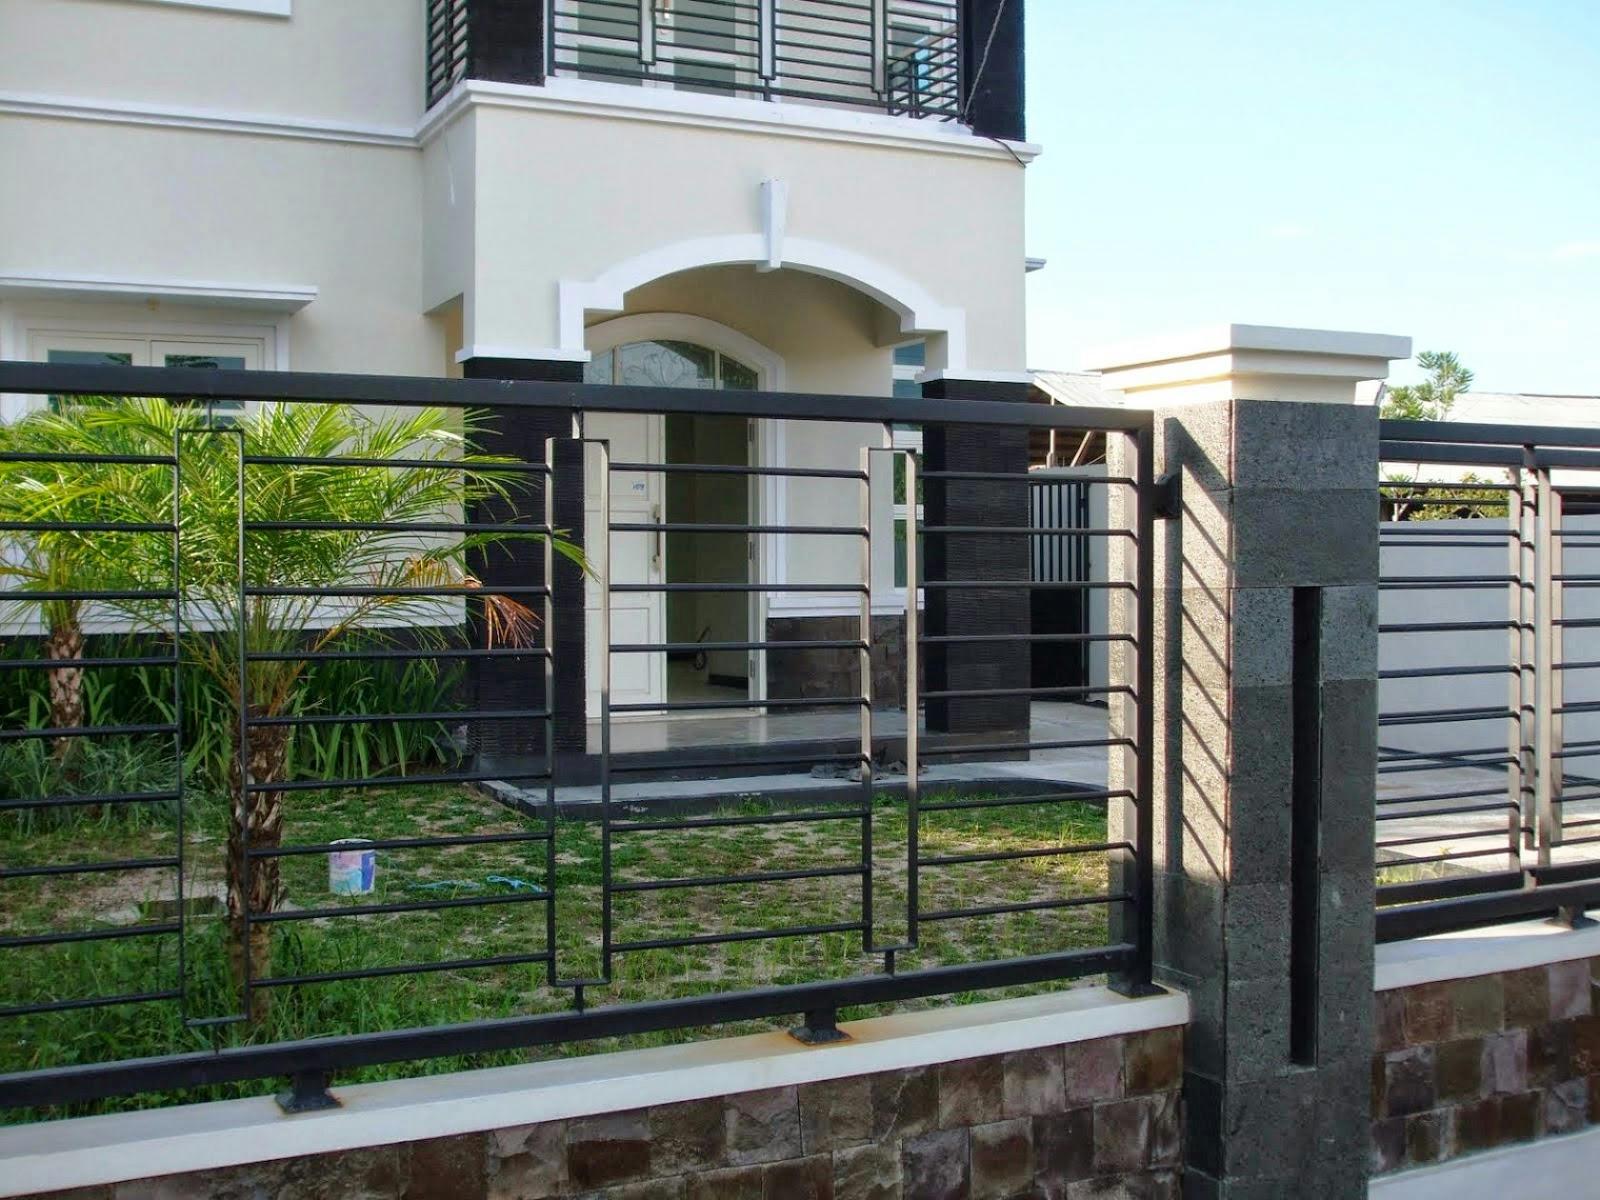 Contoh Pagar Rumah Minimalis 2016 Creo House